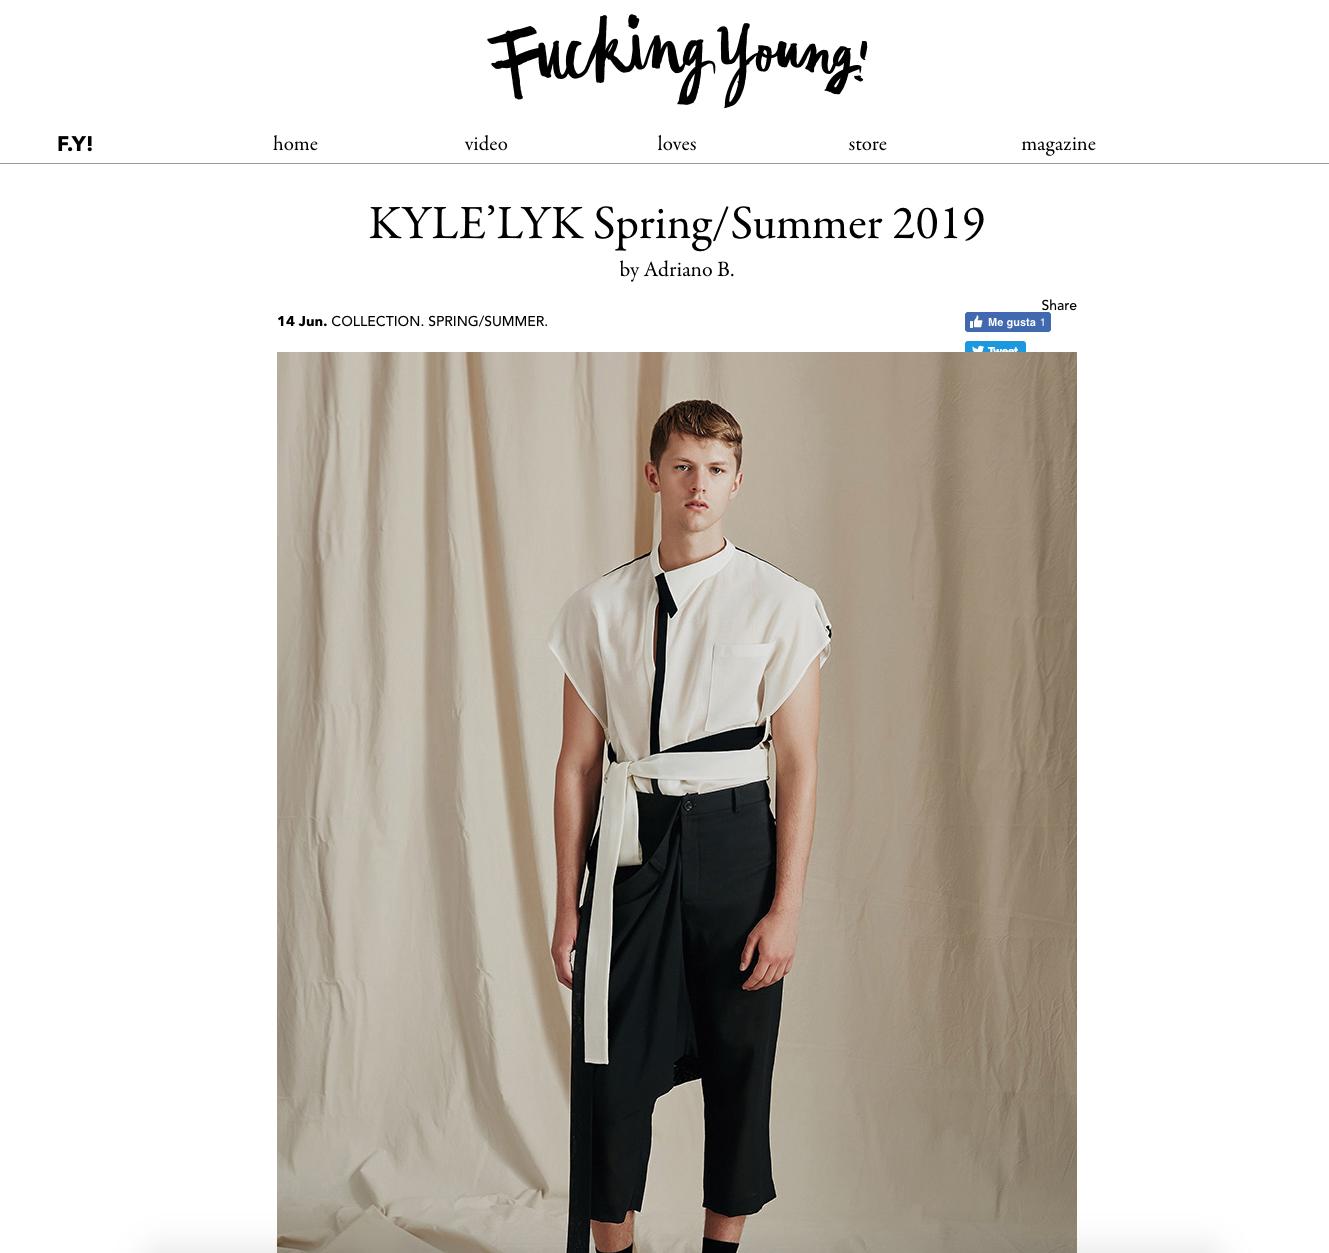 KYLE'LYK Spring/Summer 2019